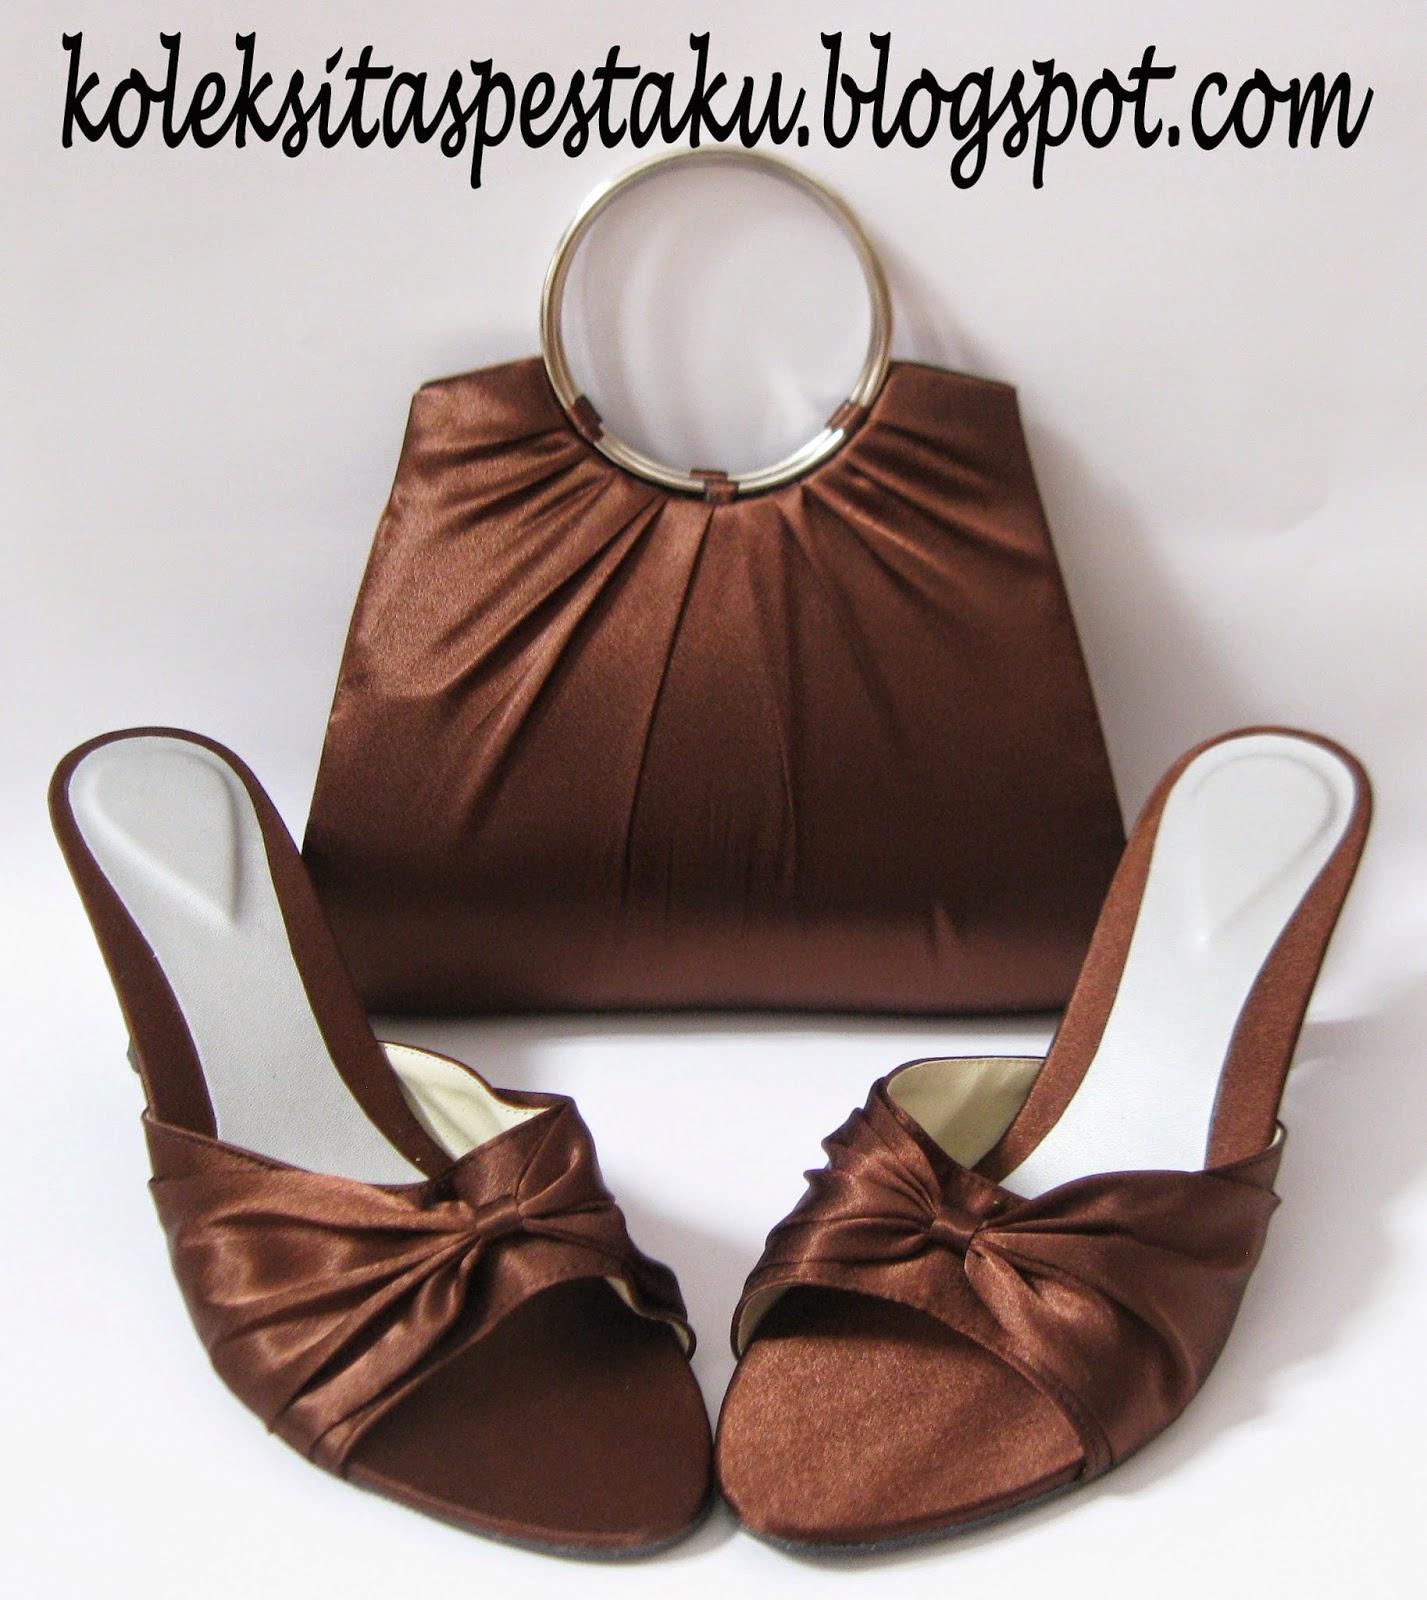 Set Matching Coklat ClutchBag Tas Pesta dan Sandal Pesta Mewah